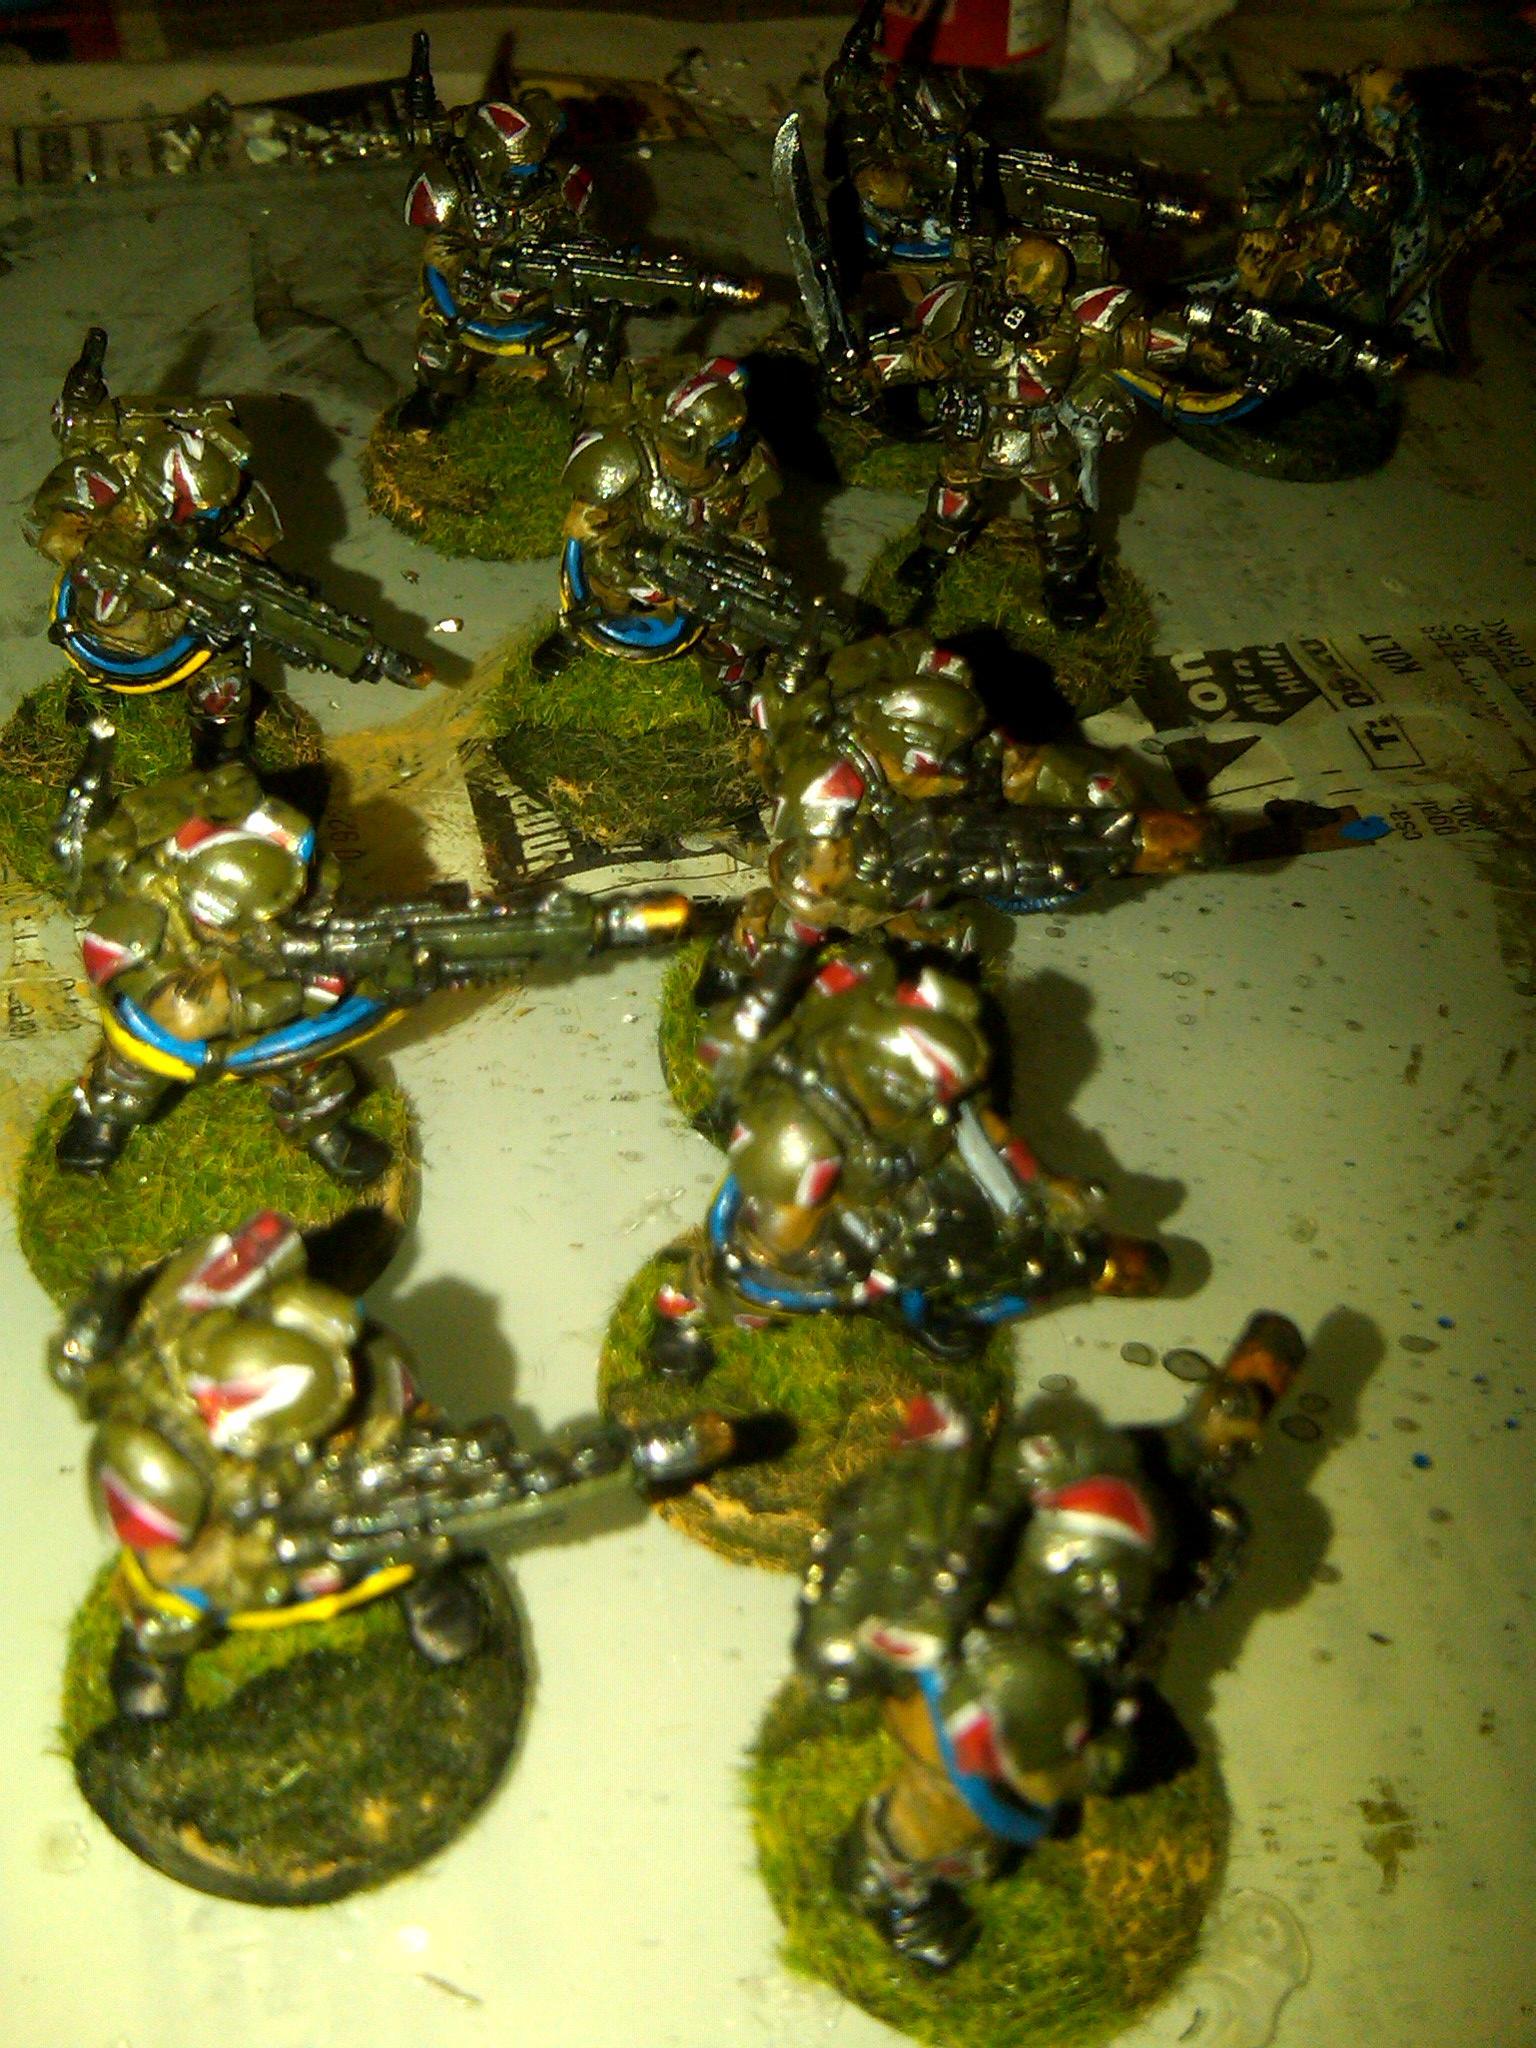 8th, Cadians, Carapace, Cut, Imperial Guard, Kasrkin, Meltagun, Metal, Primaris, Primaris Psyker, Psyker, Sergeant, Squad, Storm Troopers, Veteran